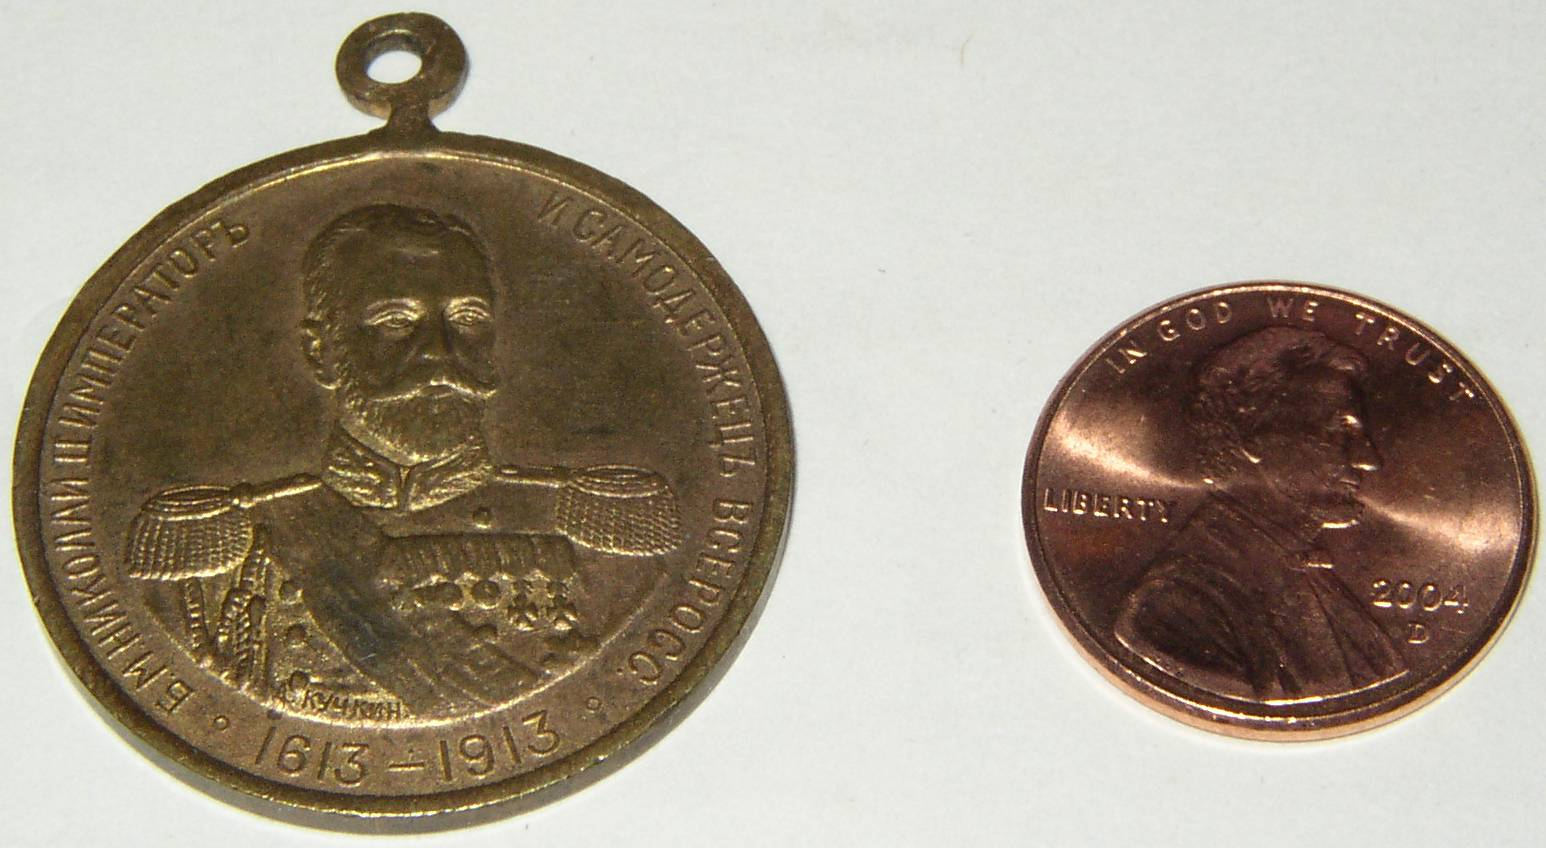 http://3.bp.blogspot.com/-wUE_t0TZSPE/TojYGmZiCjI/AAAAAAAAAaU/4ozj1OdEc2U/s1600/Russian+Medals+003.jpg